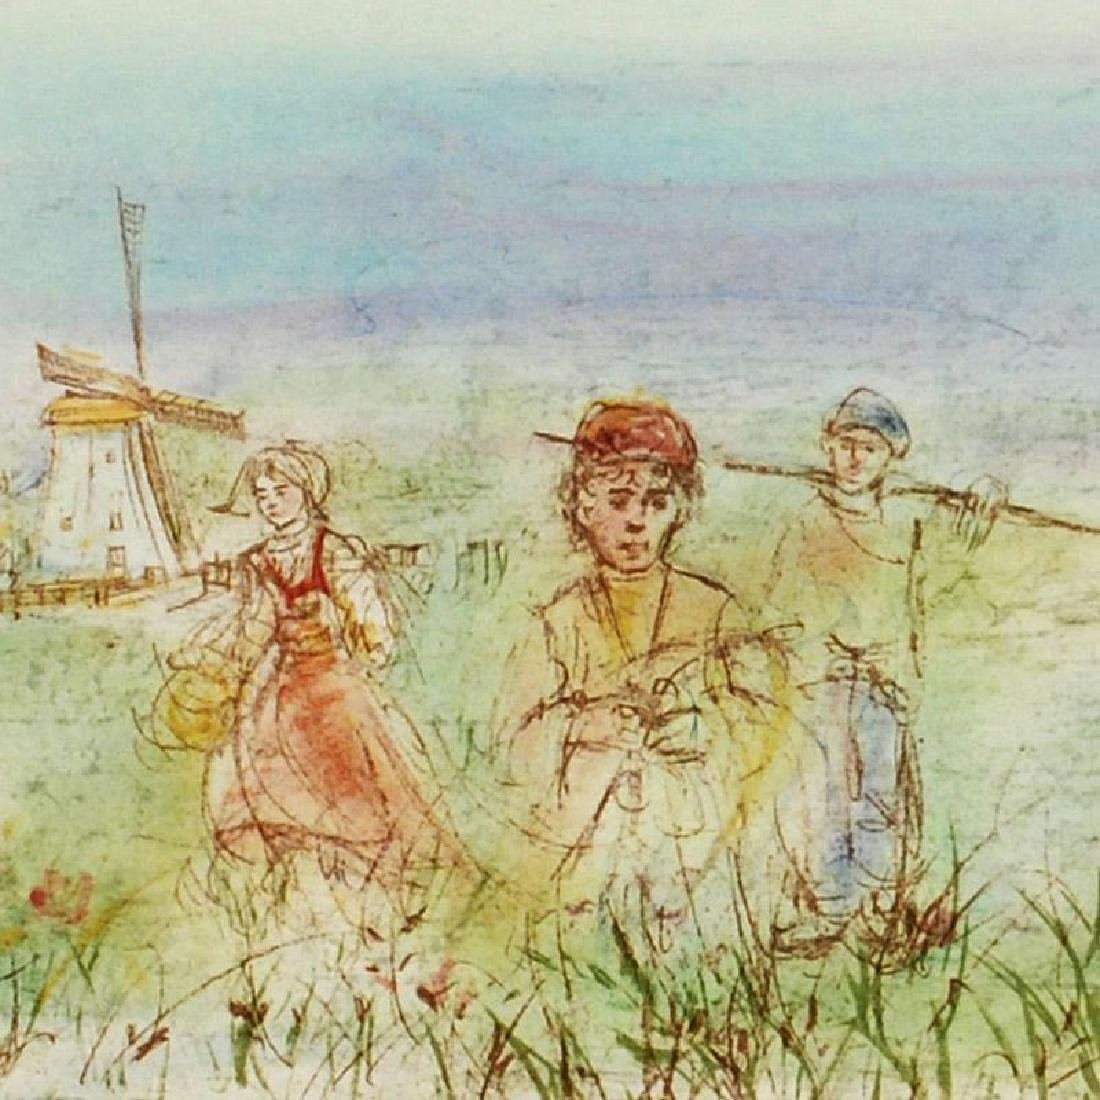 Dutch Landscape by Hibel (1917-2014) - 2